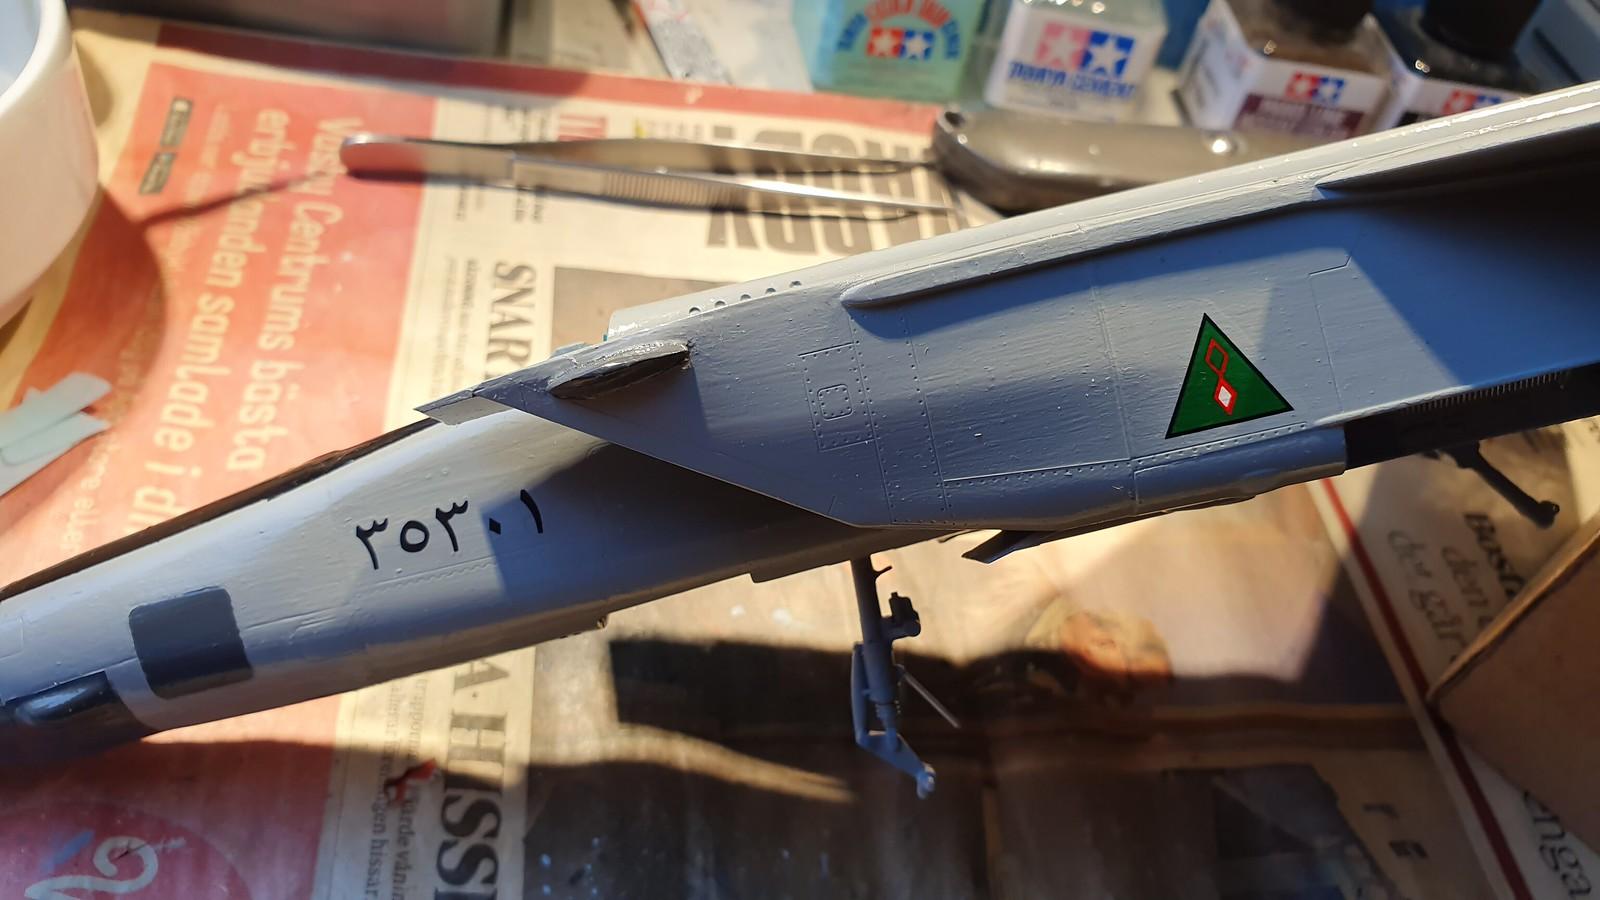 MiG-25BM Iraqi Air Force 1988 - ICM/Revell 1/48 + extra - Färdig! - Sida 7 48936314203_ab0e155870_h